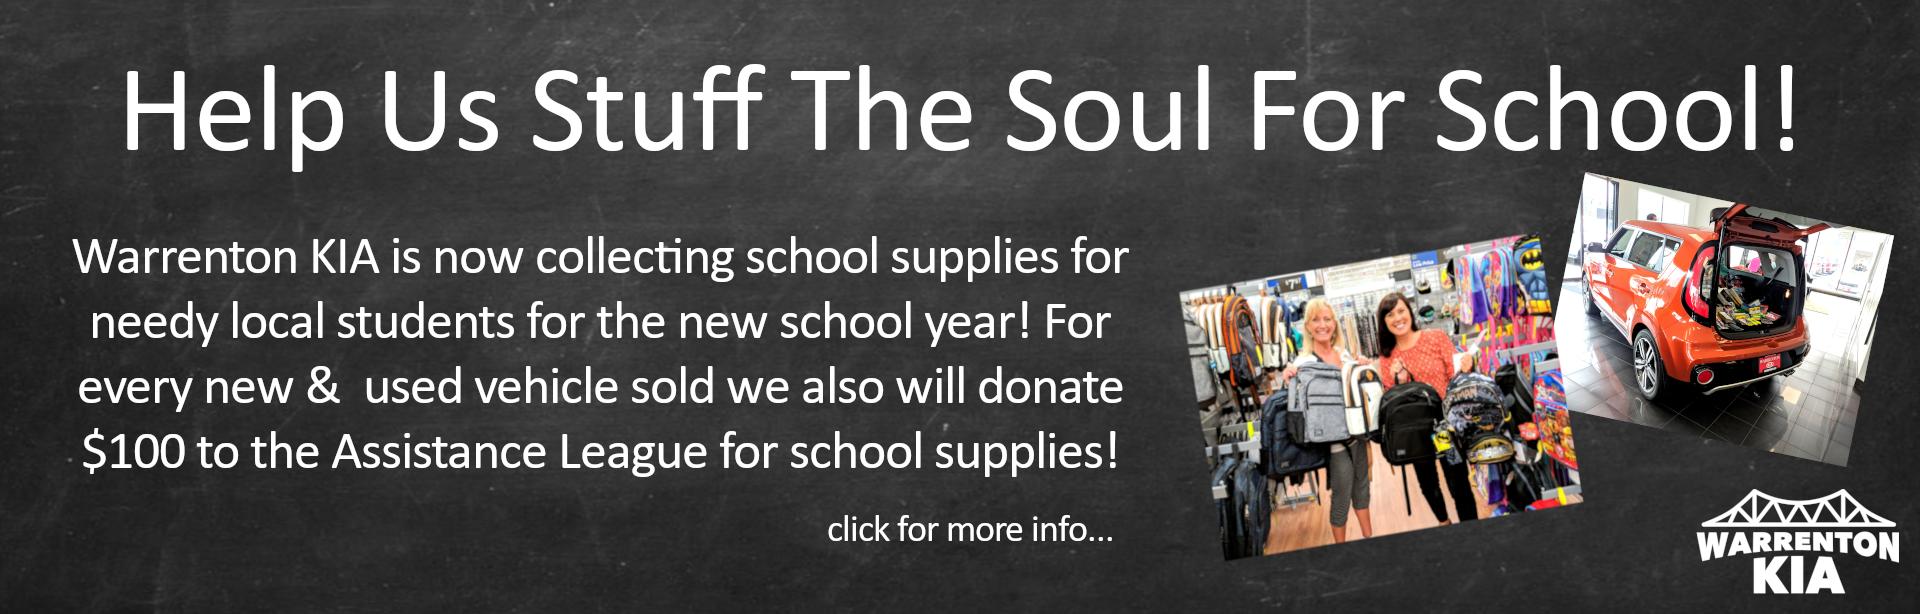 Stuff the Soul for School